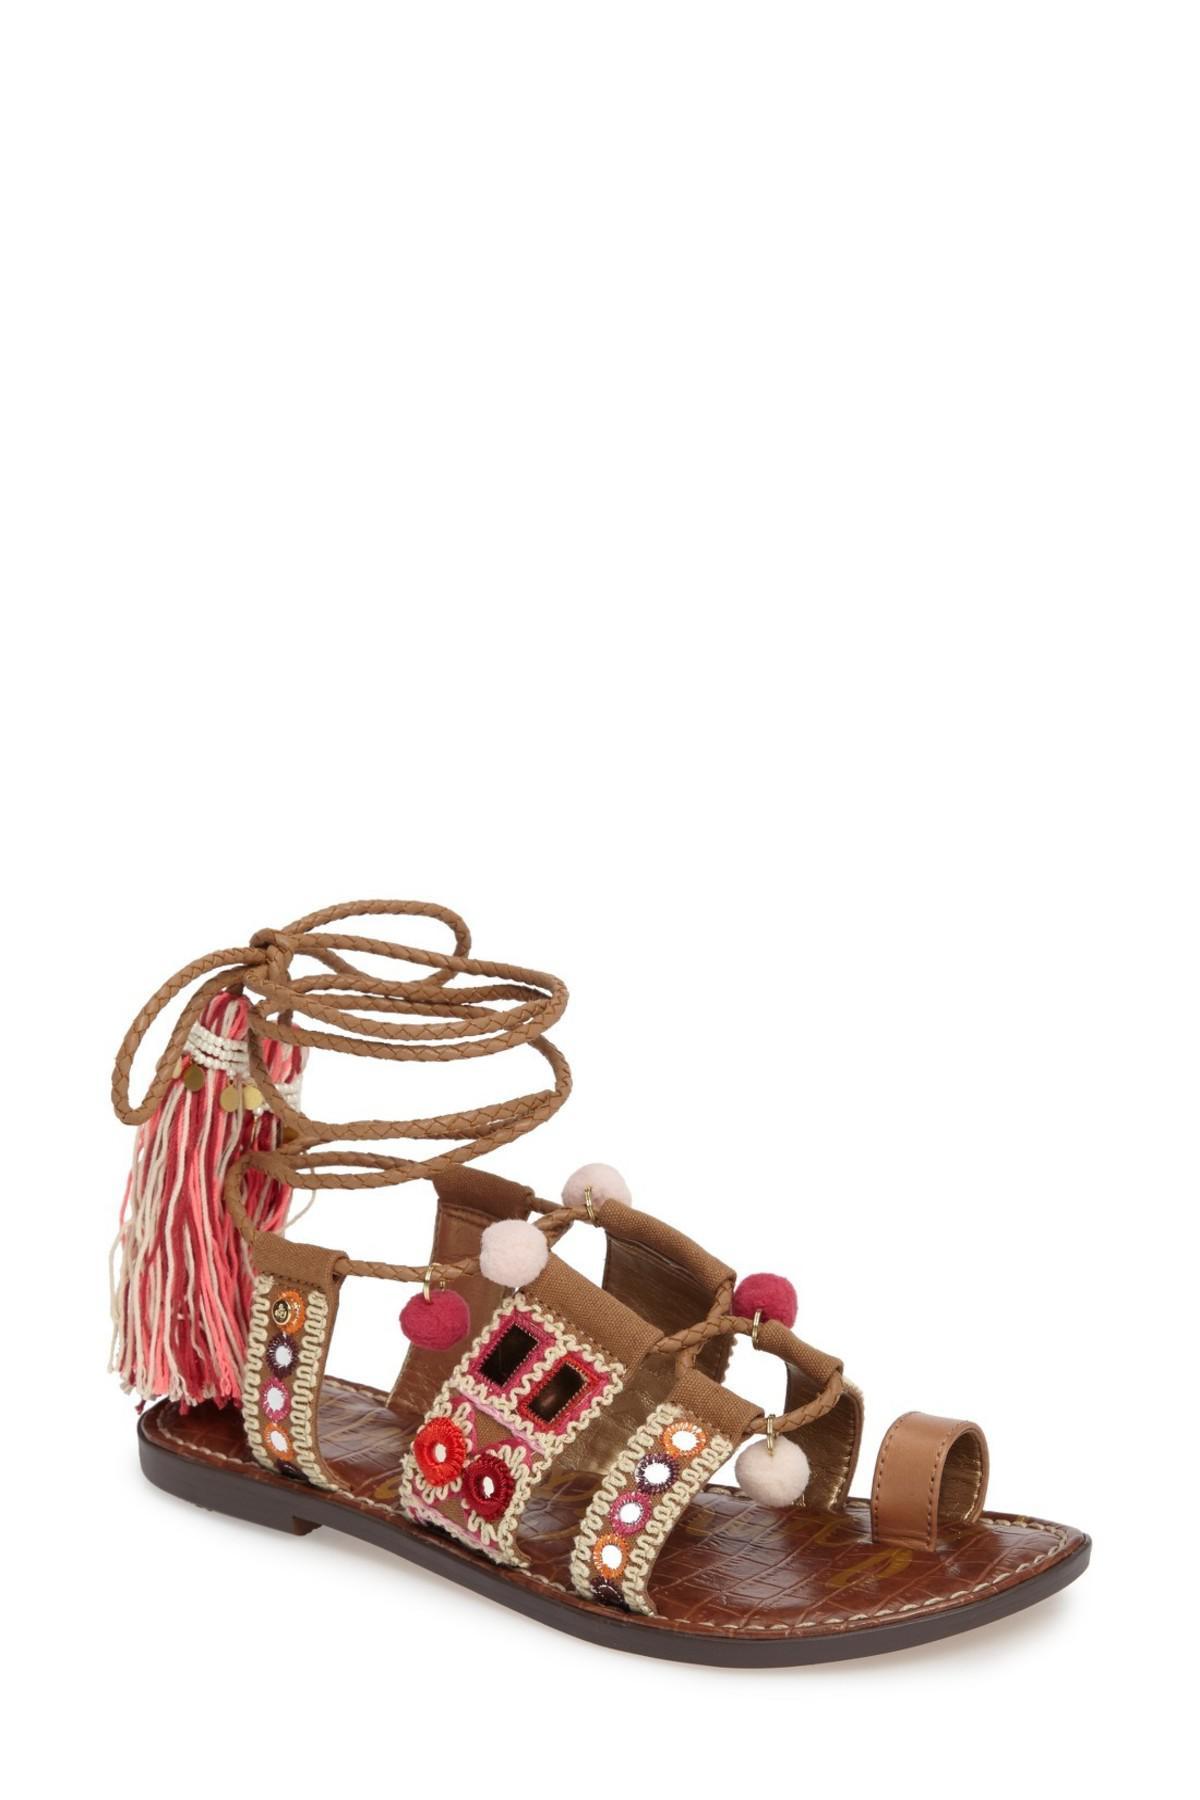 fc54b7572f5 Lyst - Sam Edelman Gretchen Leather-blend Sandals in Pink